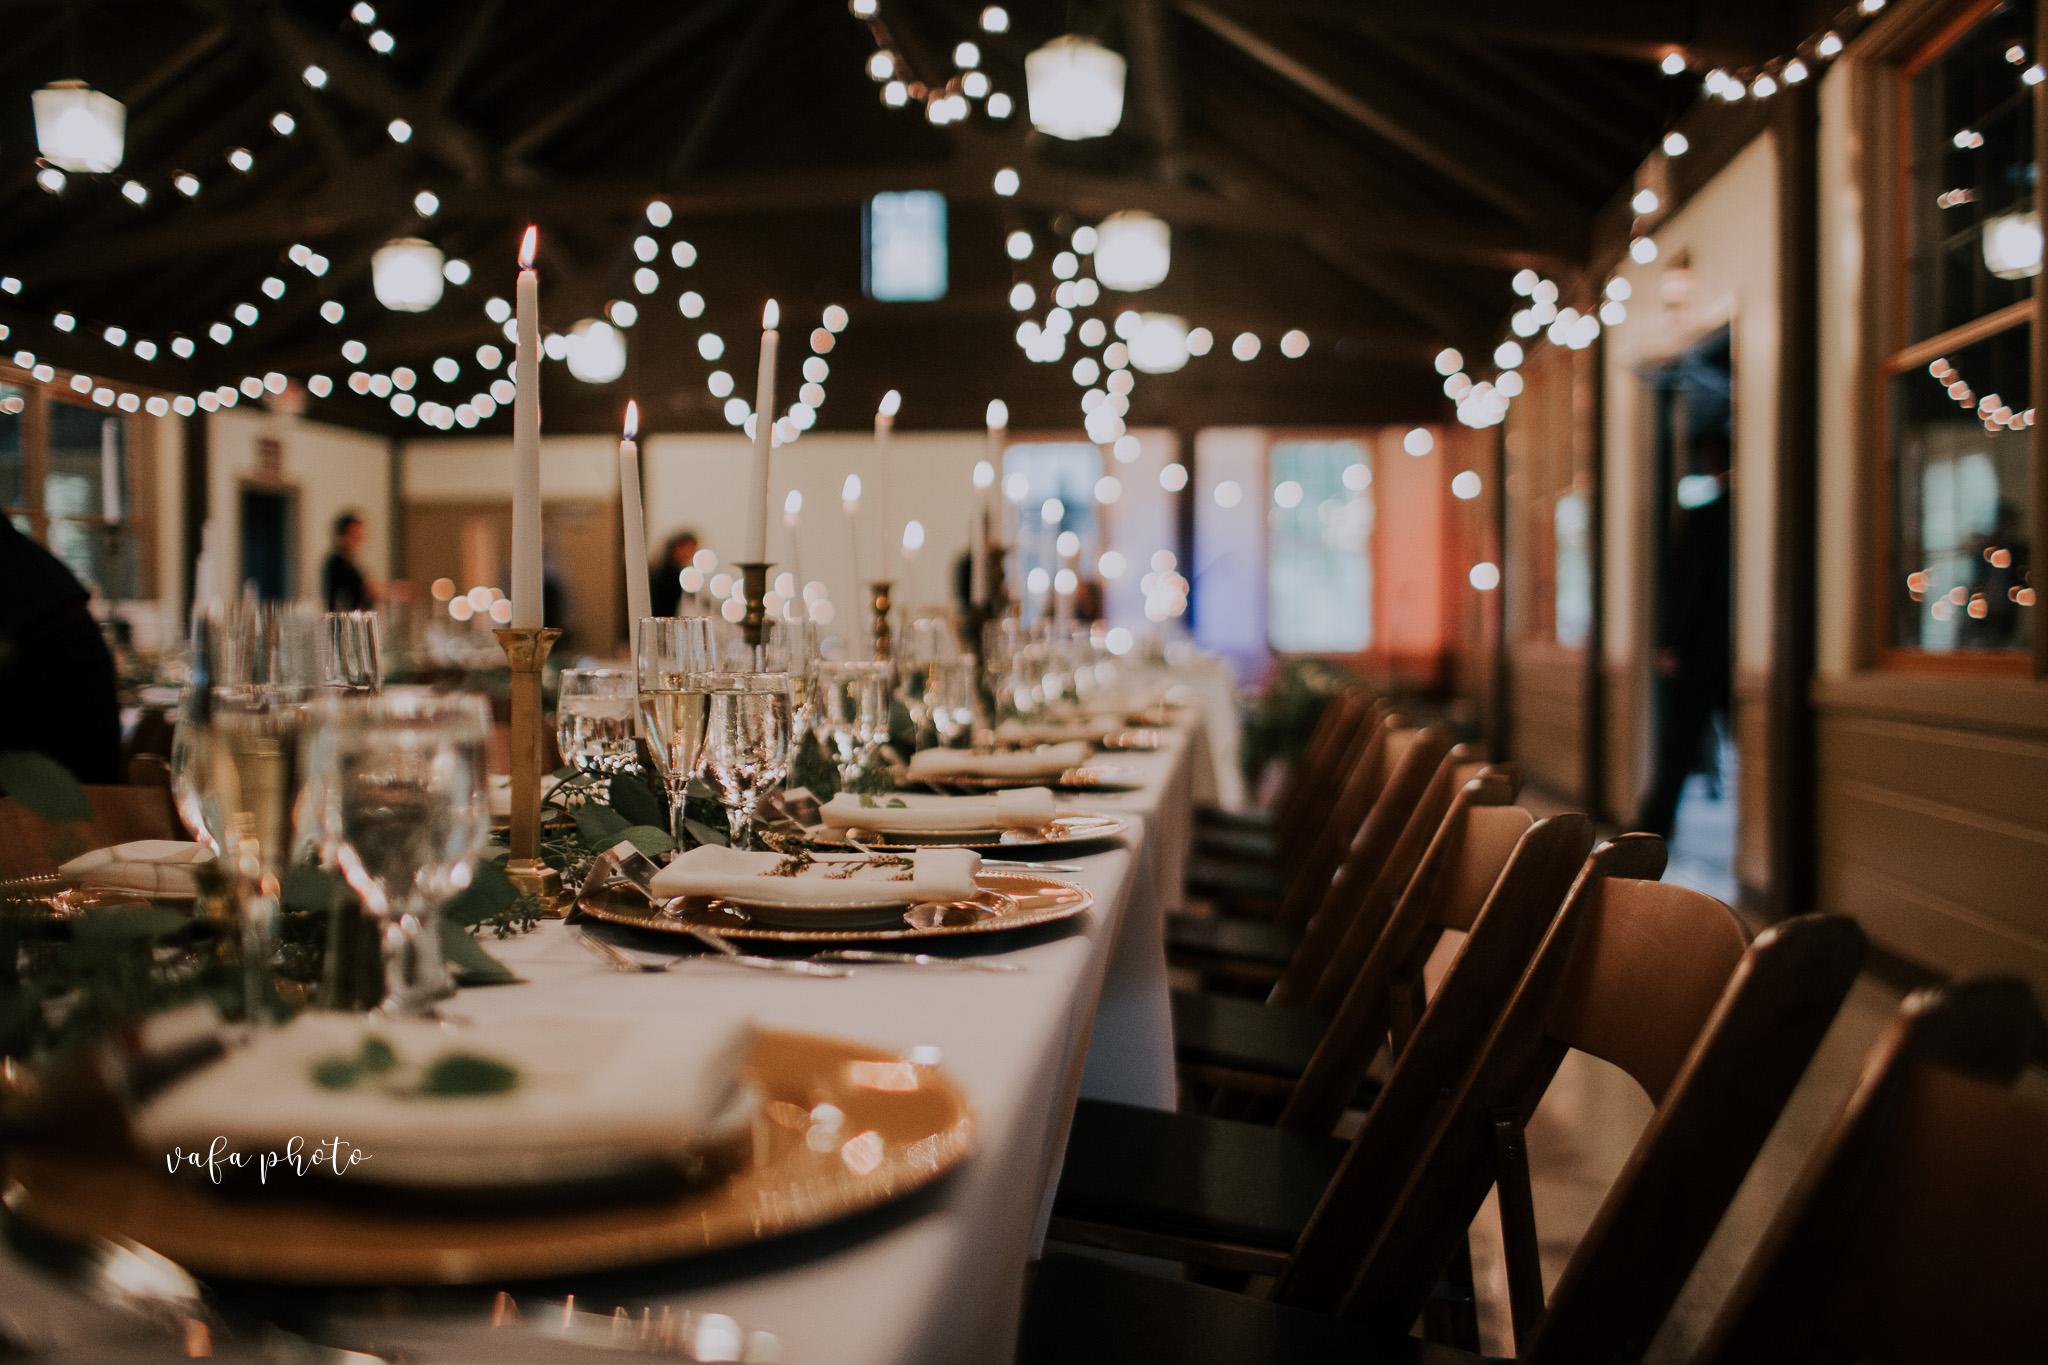 Grand-Rapids-Wedding-Danielle-Brian-Vafa-Photo-453.jpg